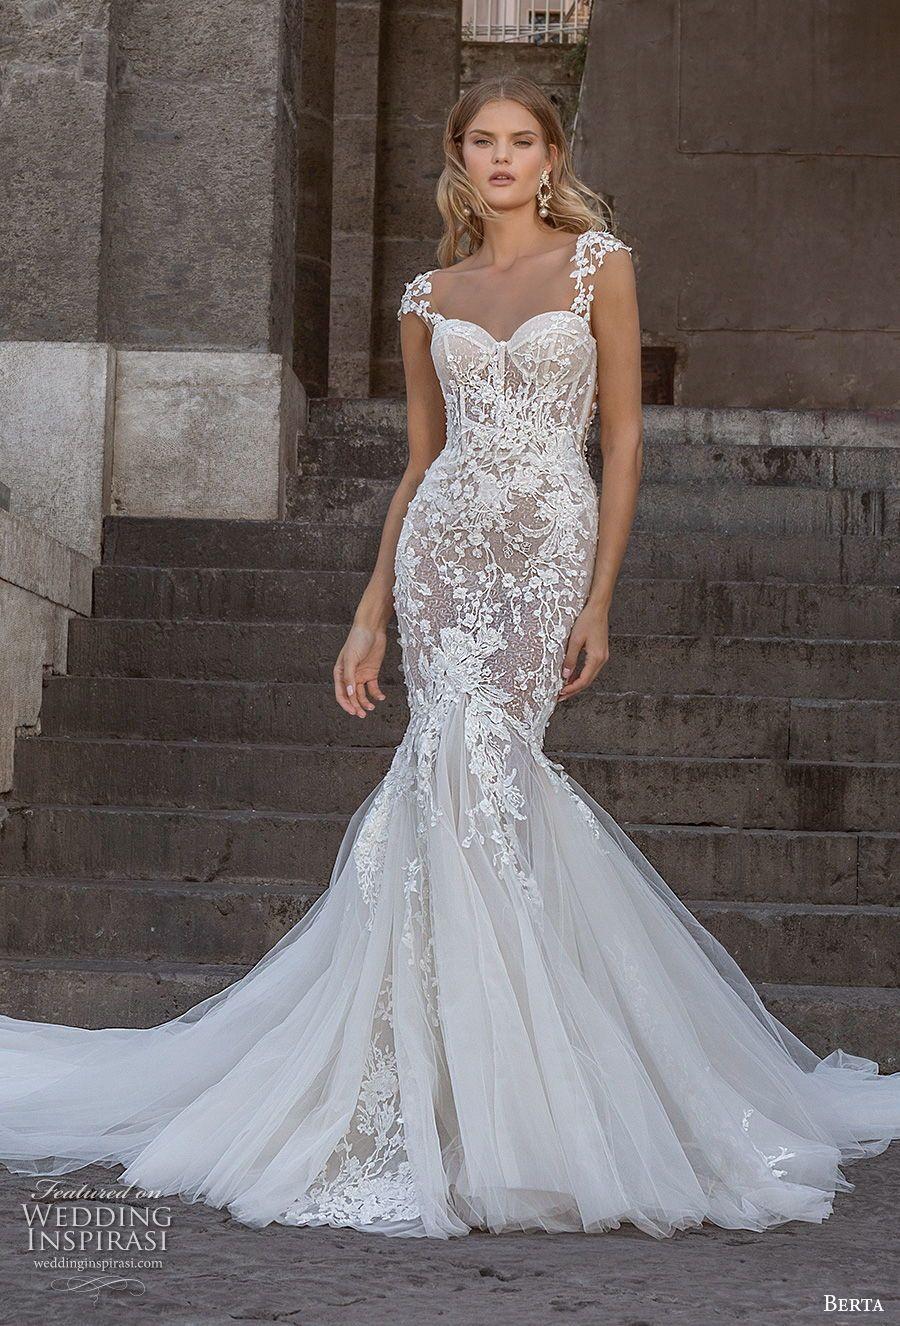 Berta Fall 2020 Wedding Dresses Napoli Bridal Collection Wedding Inspirasi Wedding Dresses Lace Mermaid Wedding Dress Mermaid Wedding Dress [ 1326 x 900 Pixel ]